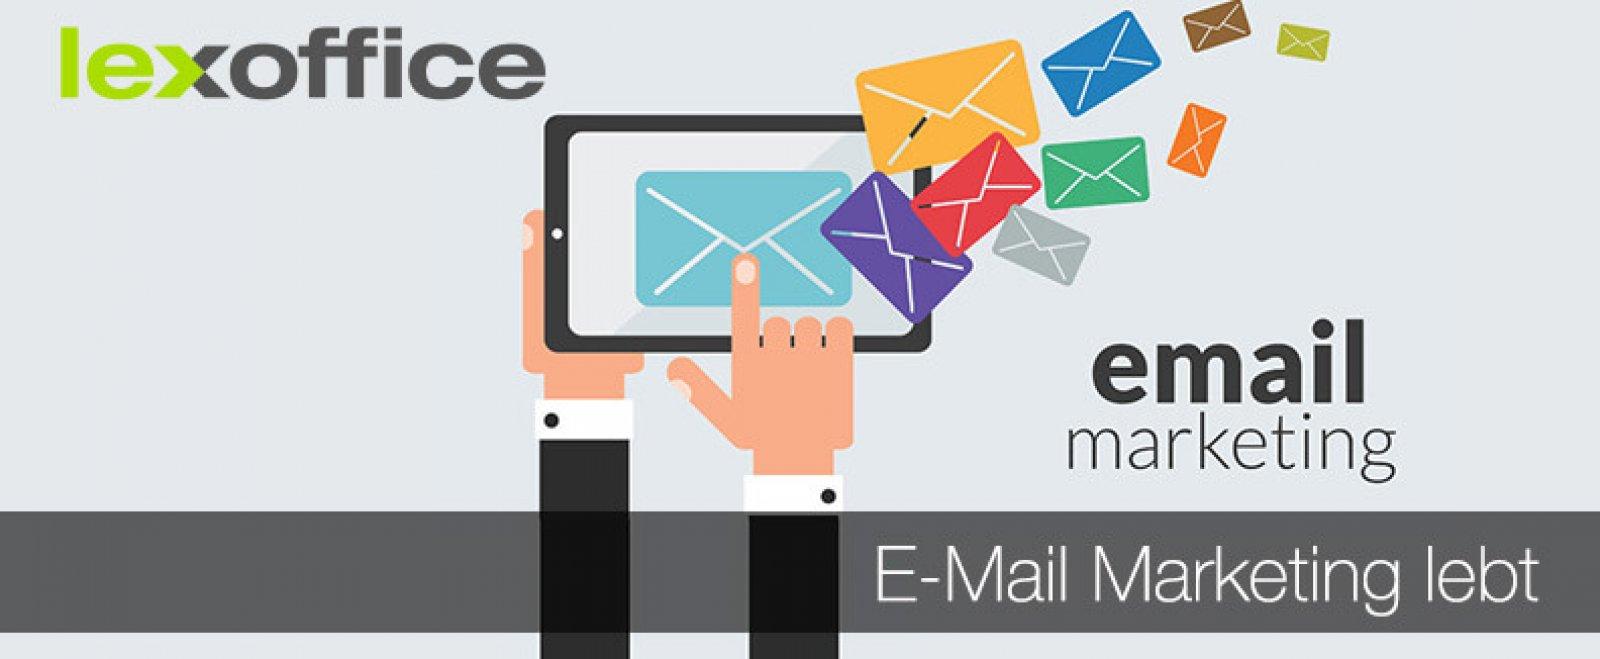 Online-Marketing: E-Mail Marketing lebt